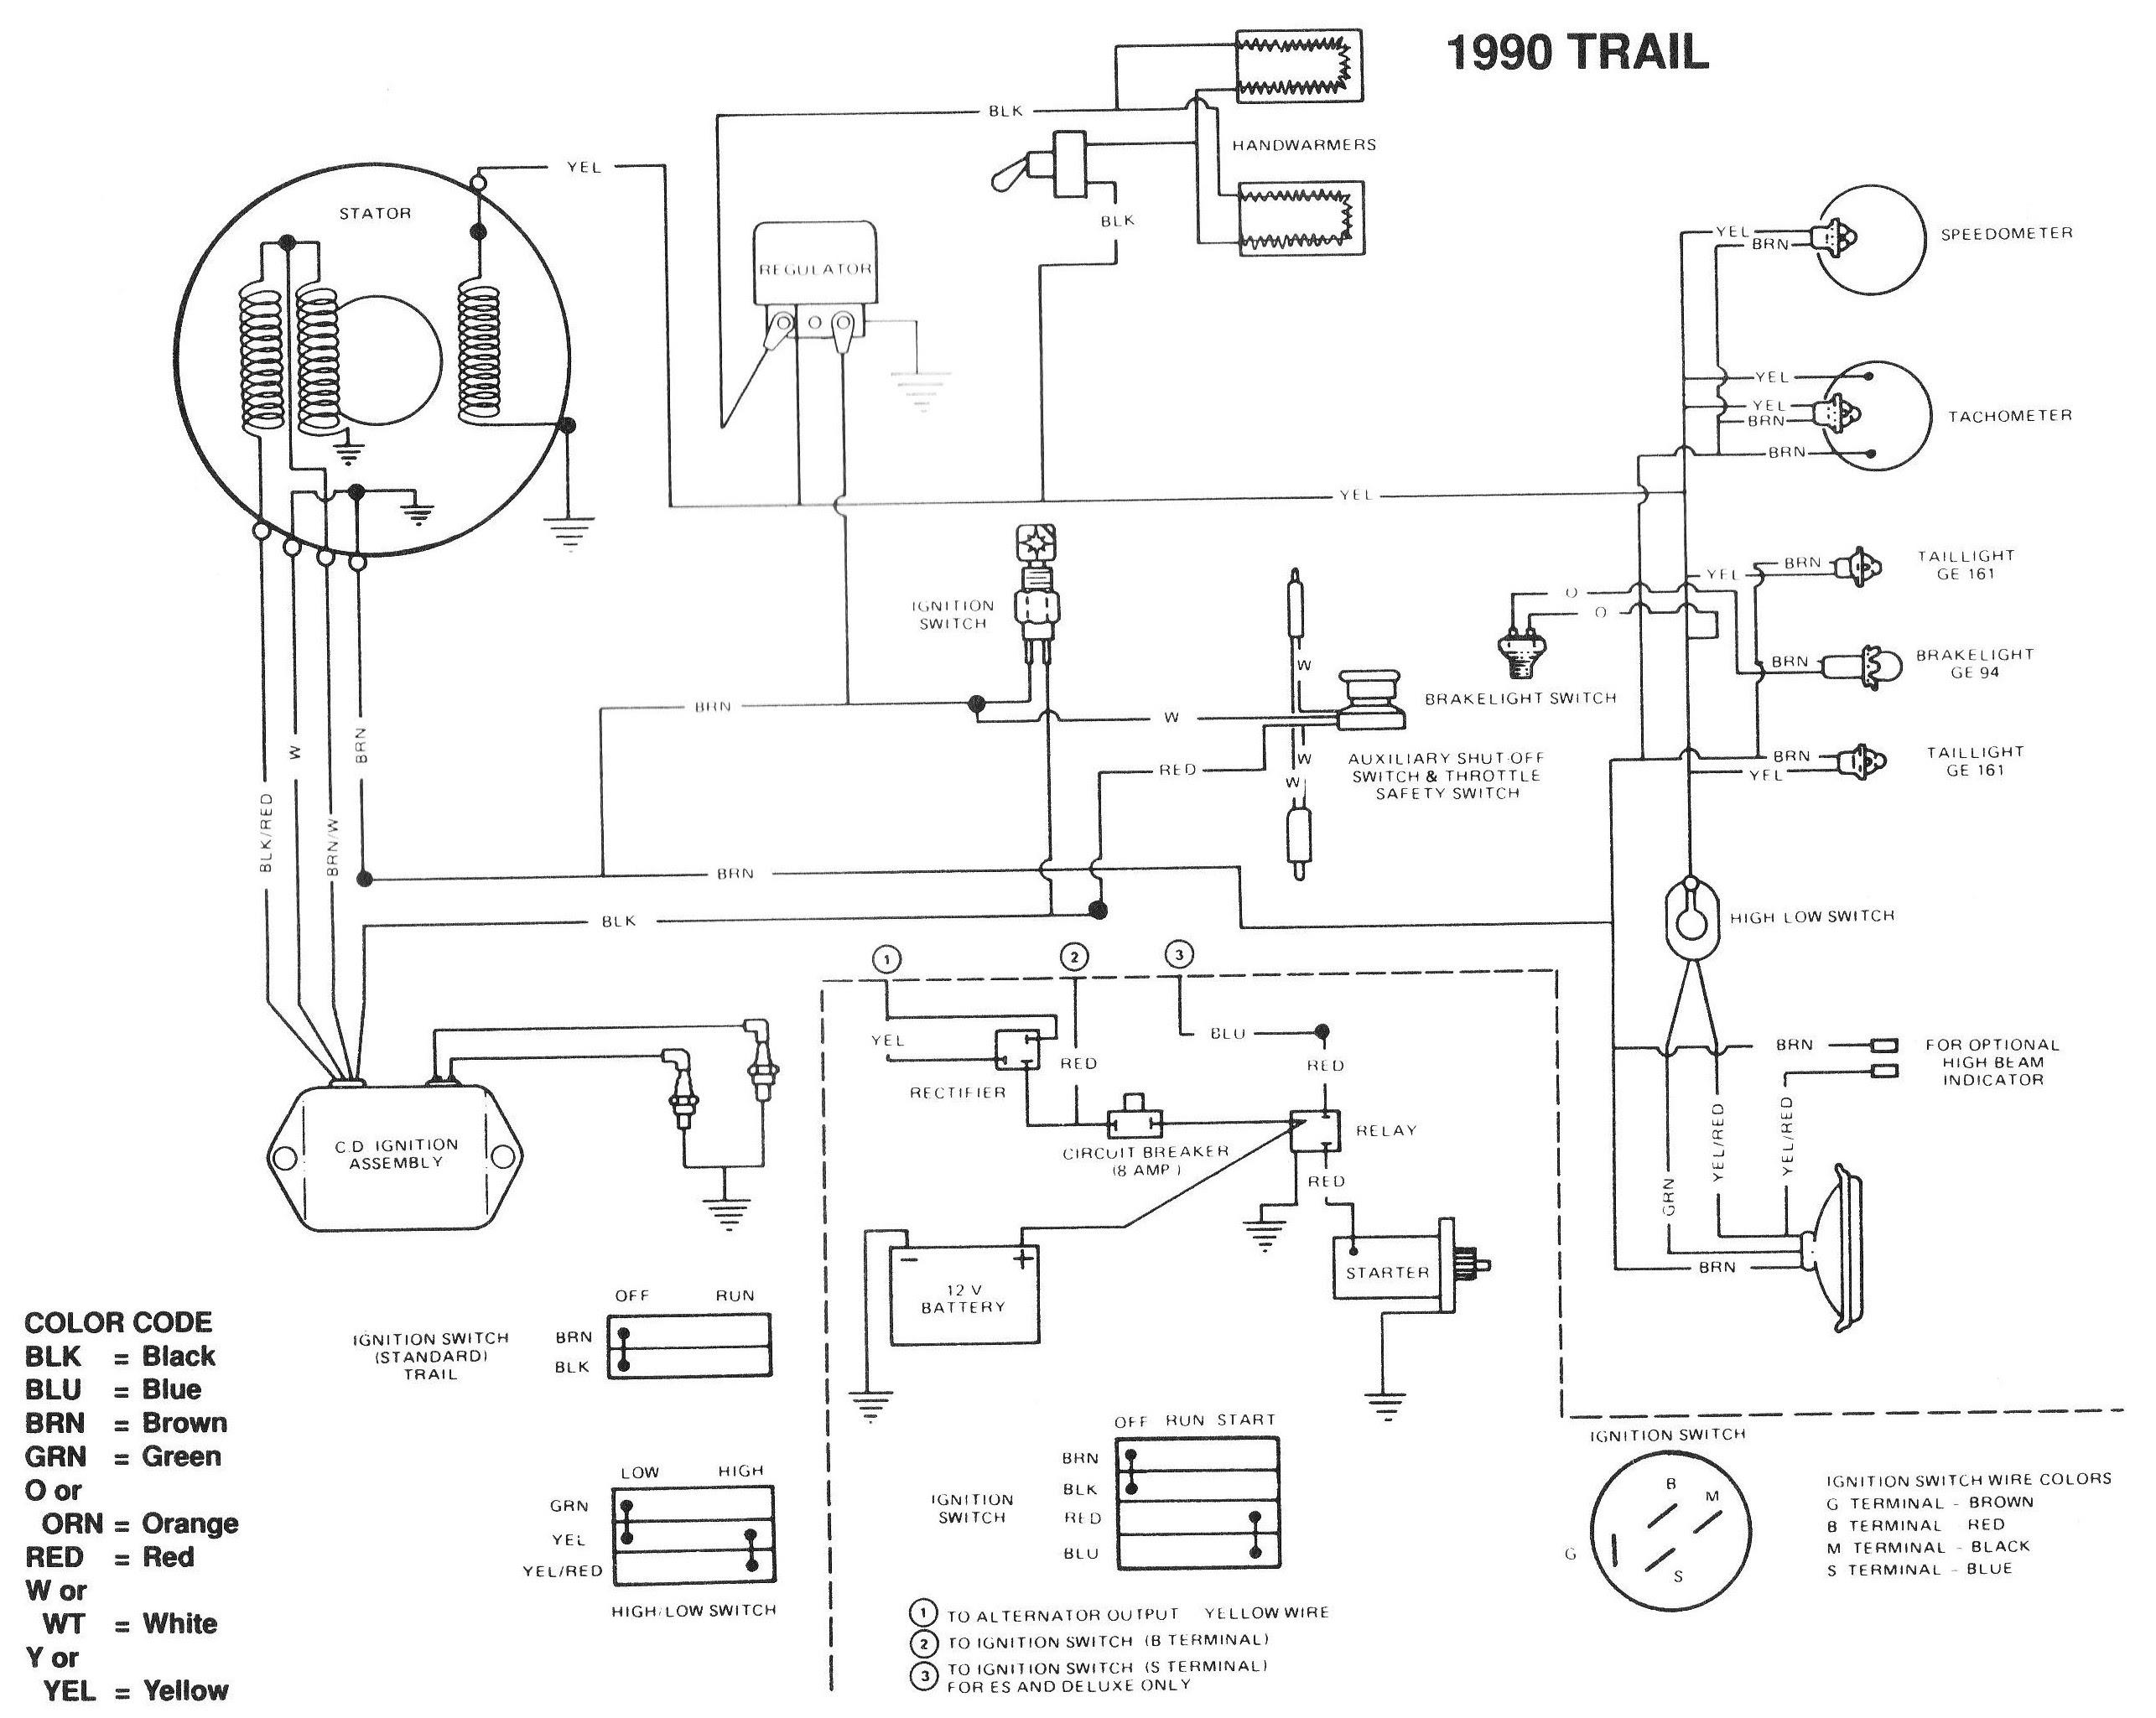 2004 Polaris Trailblazer 250 Wiring Diagram